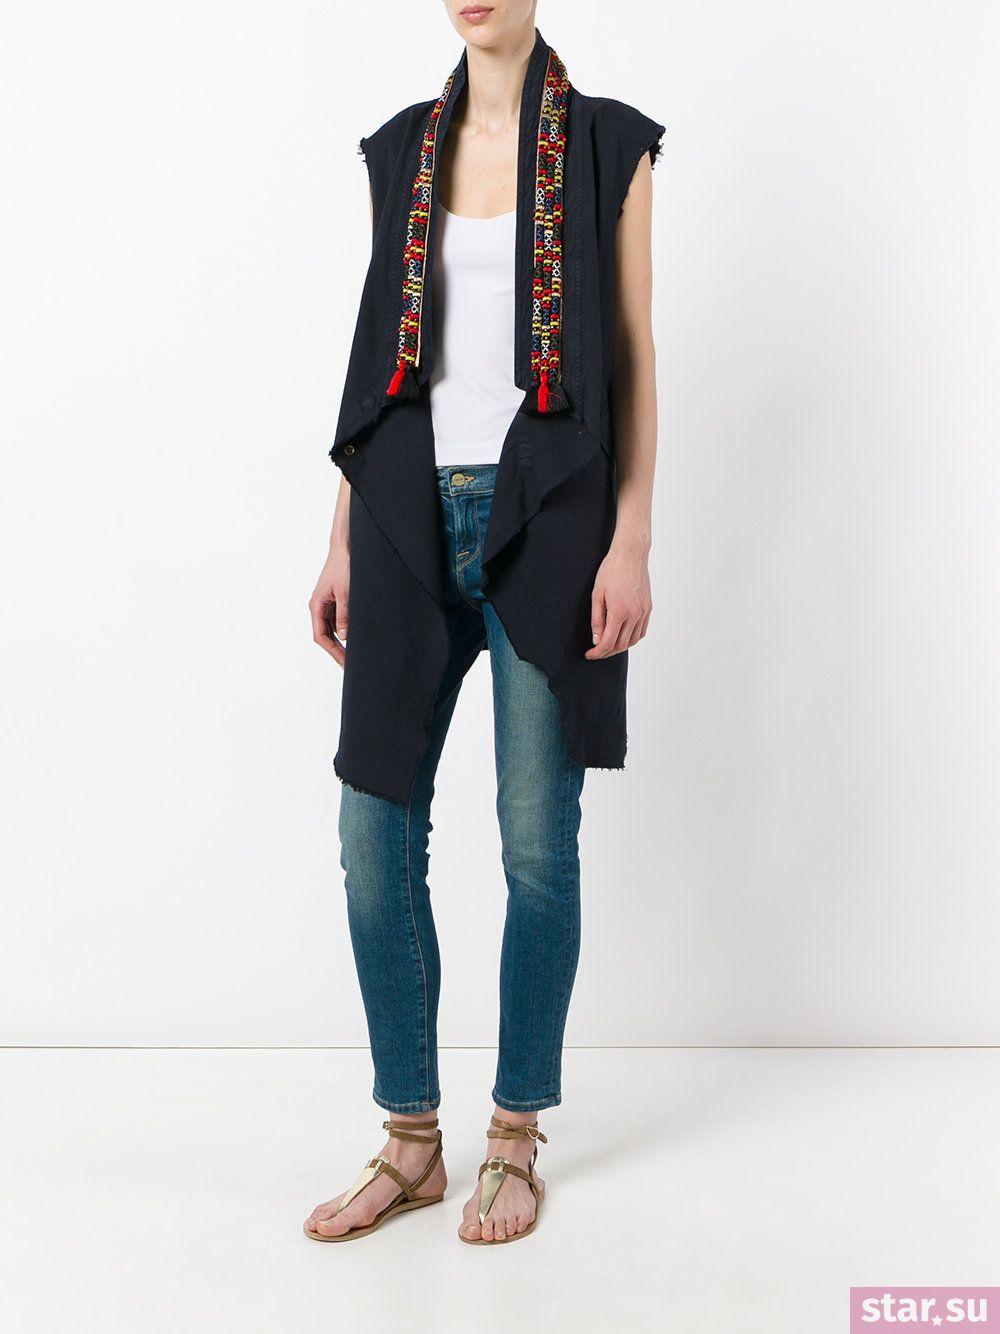 2dd7c51e9051 Με τι να φοράτε ένα επίμηκες πλεκτό γιλέκο χωρίς μανίκια